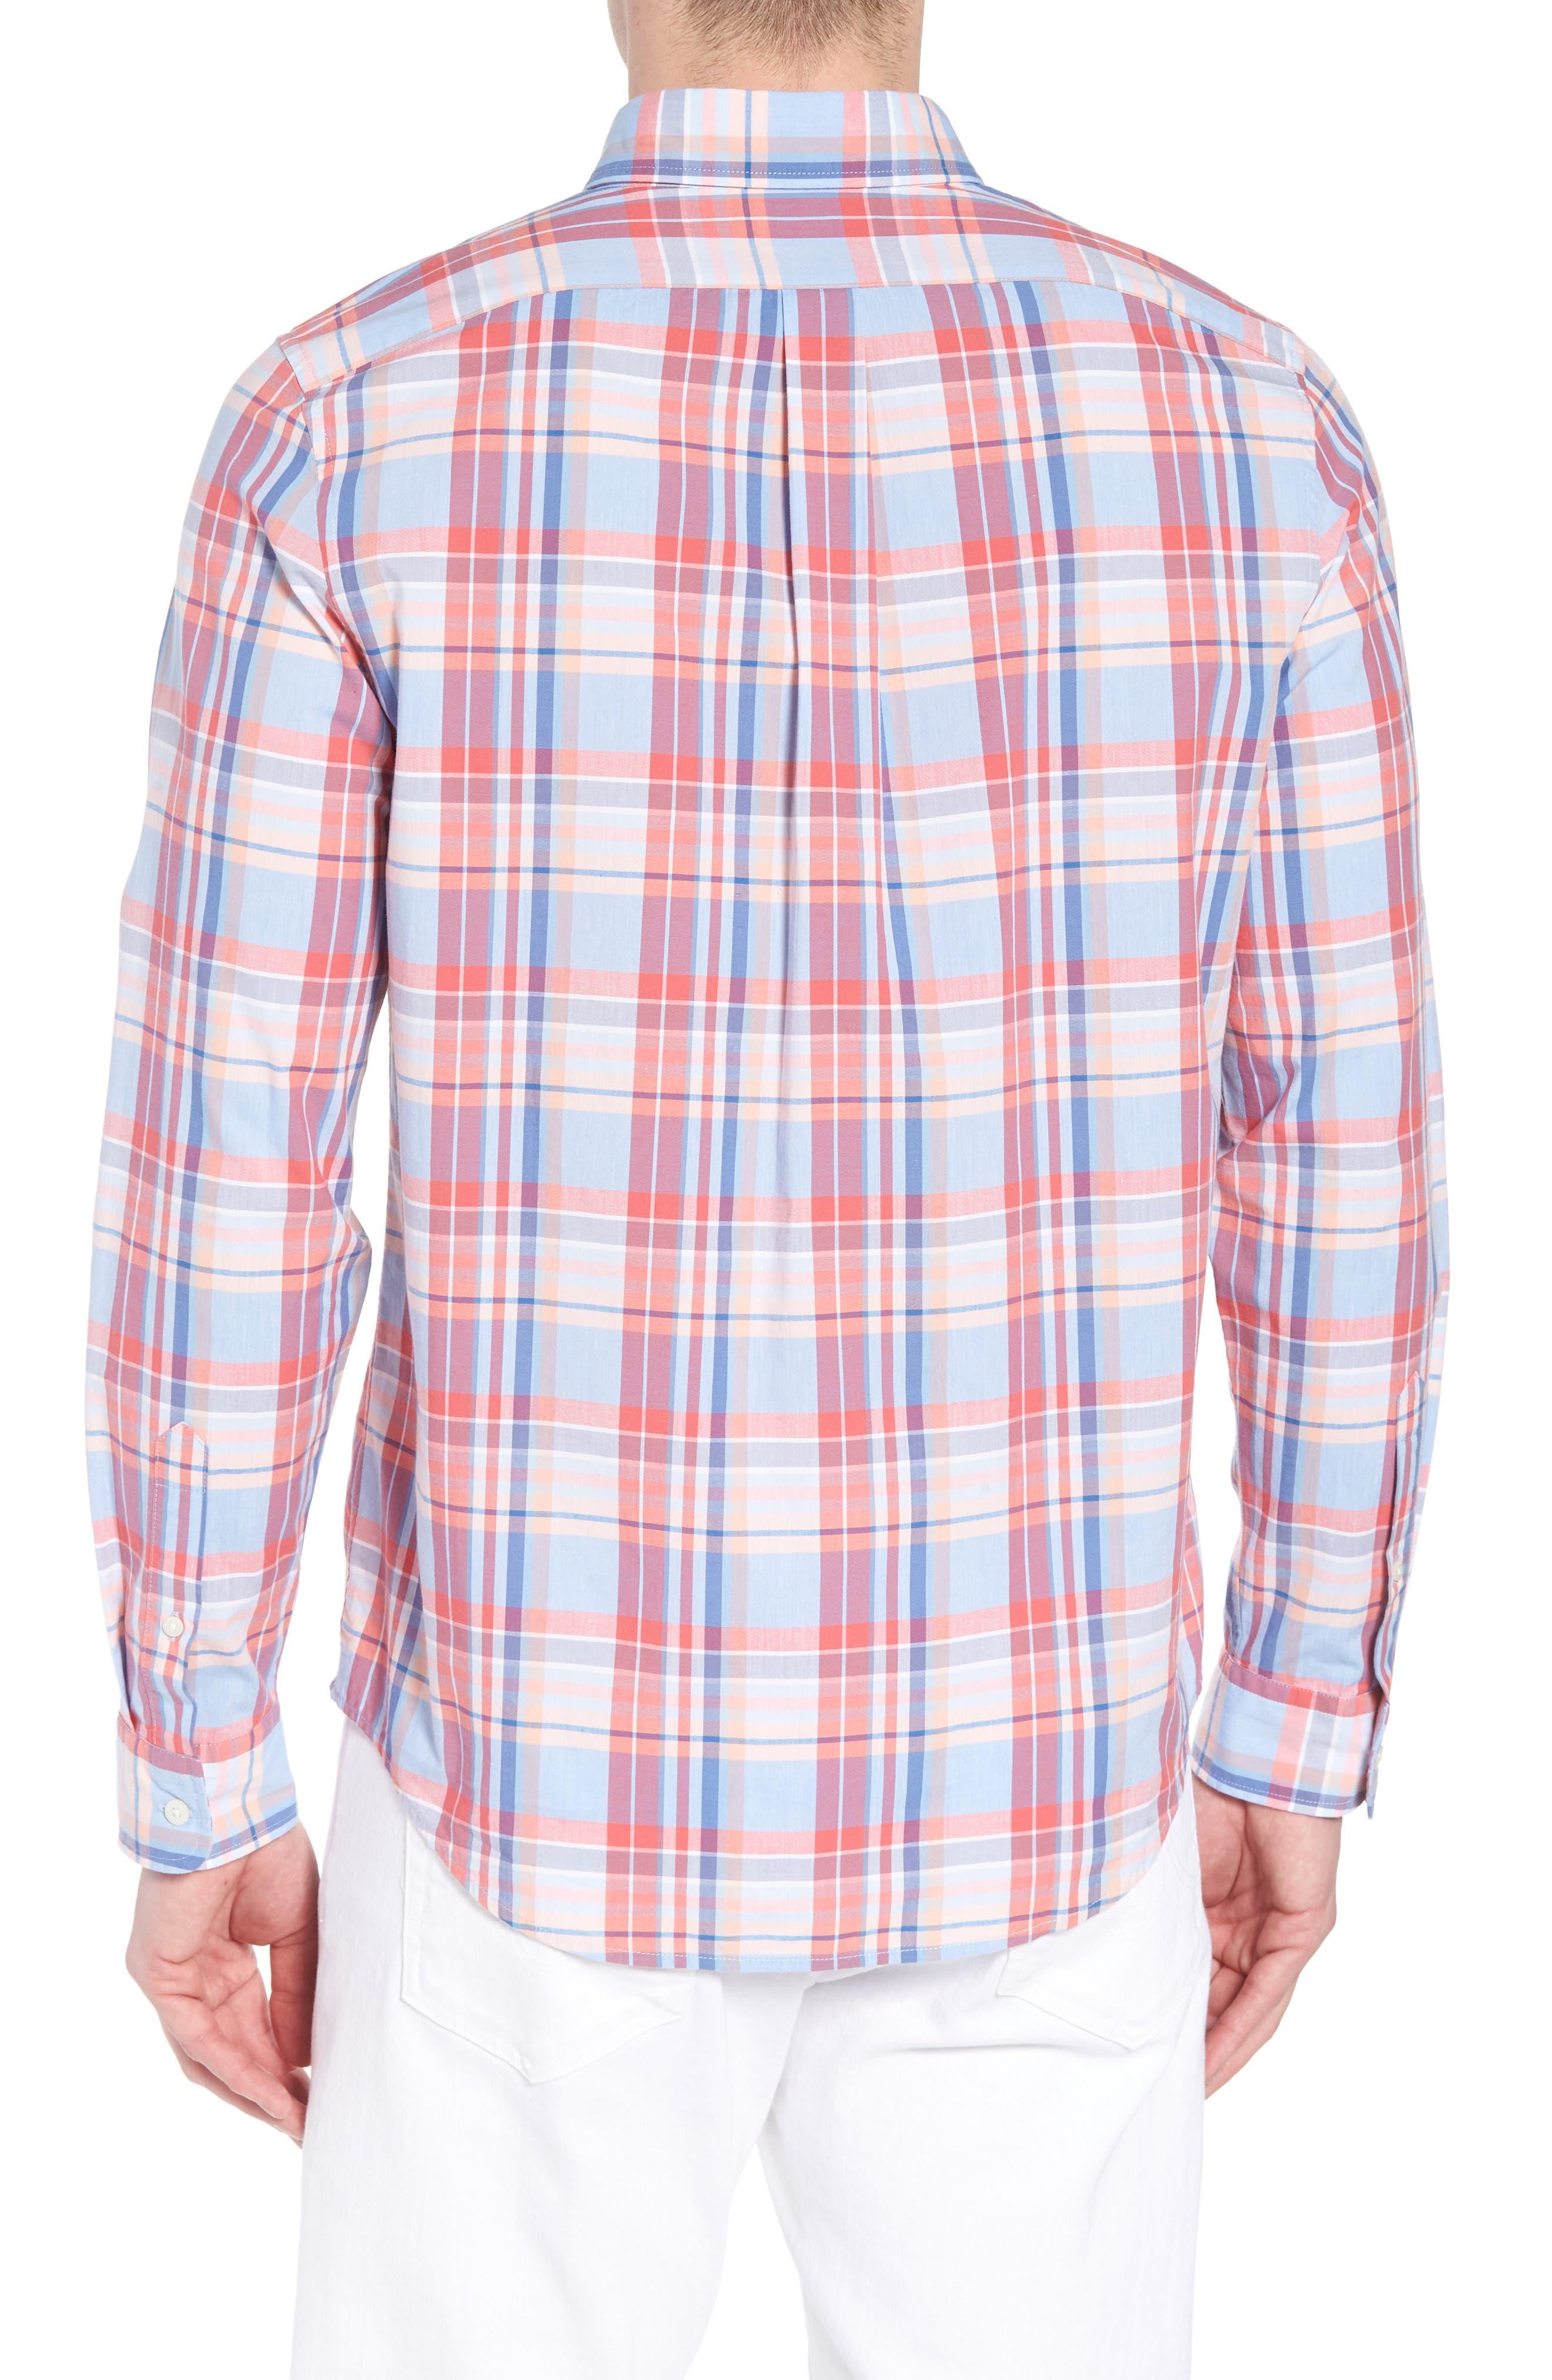 Fox Town Slim Fit Plaid Sport Shirt,                             Alternate thumbnail 2, color,                             628